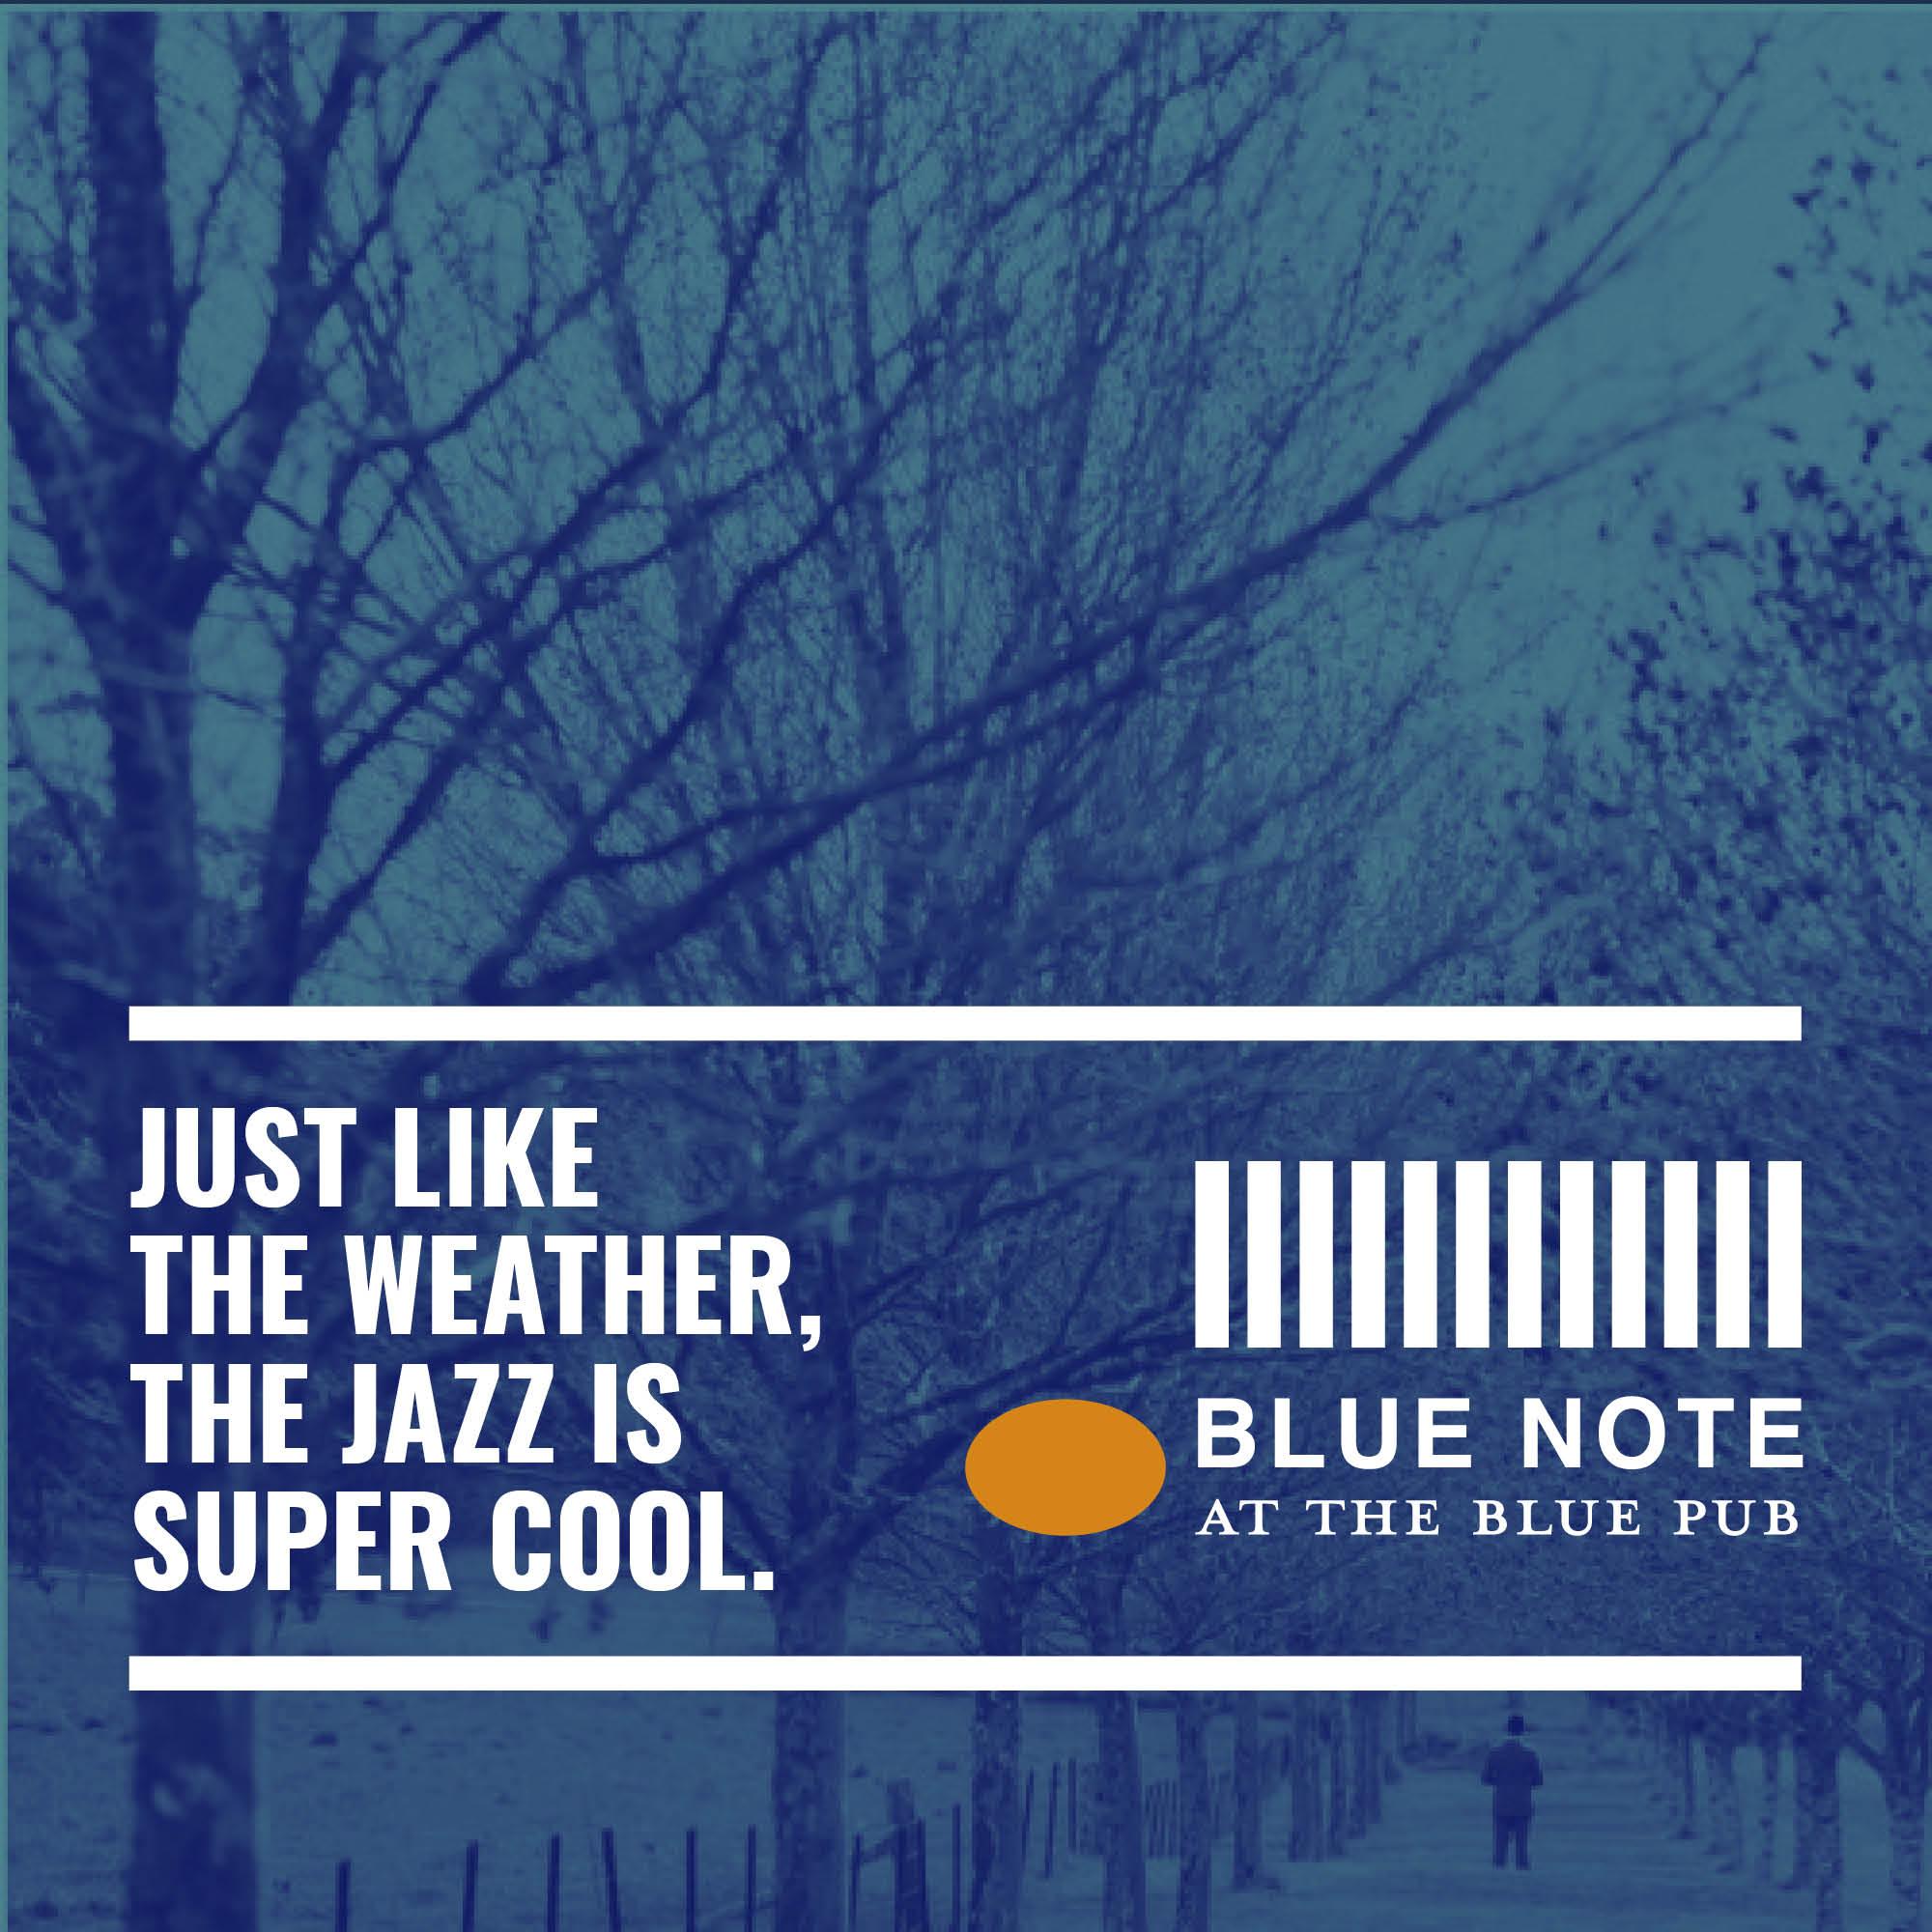 Facebook_July Blue Note2.jpg